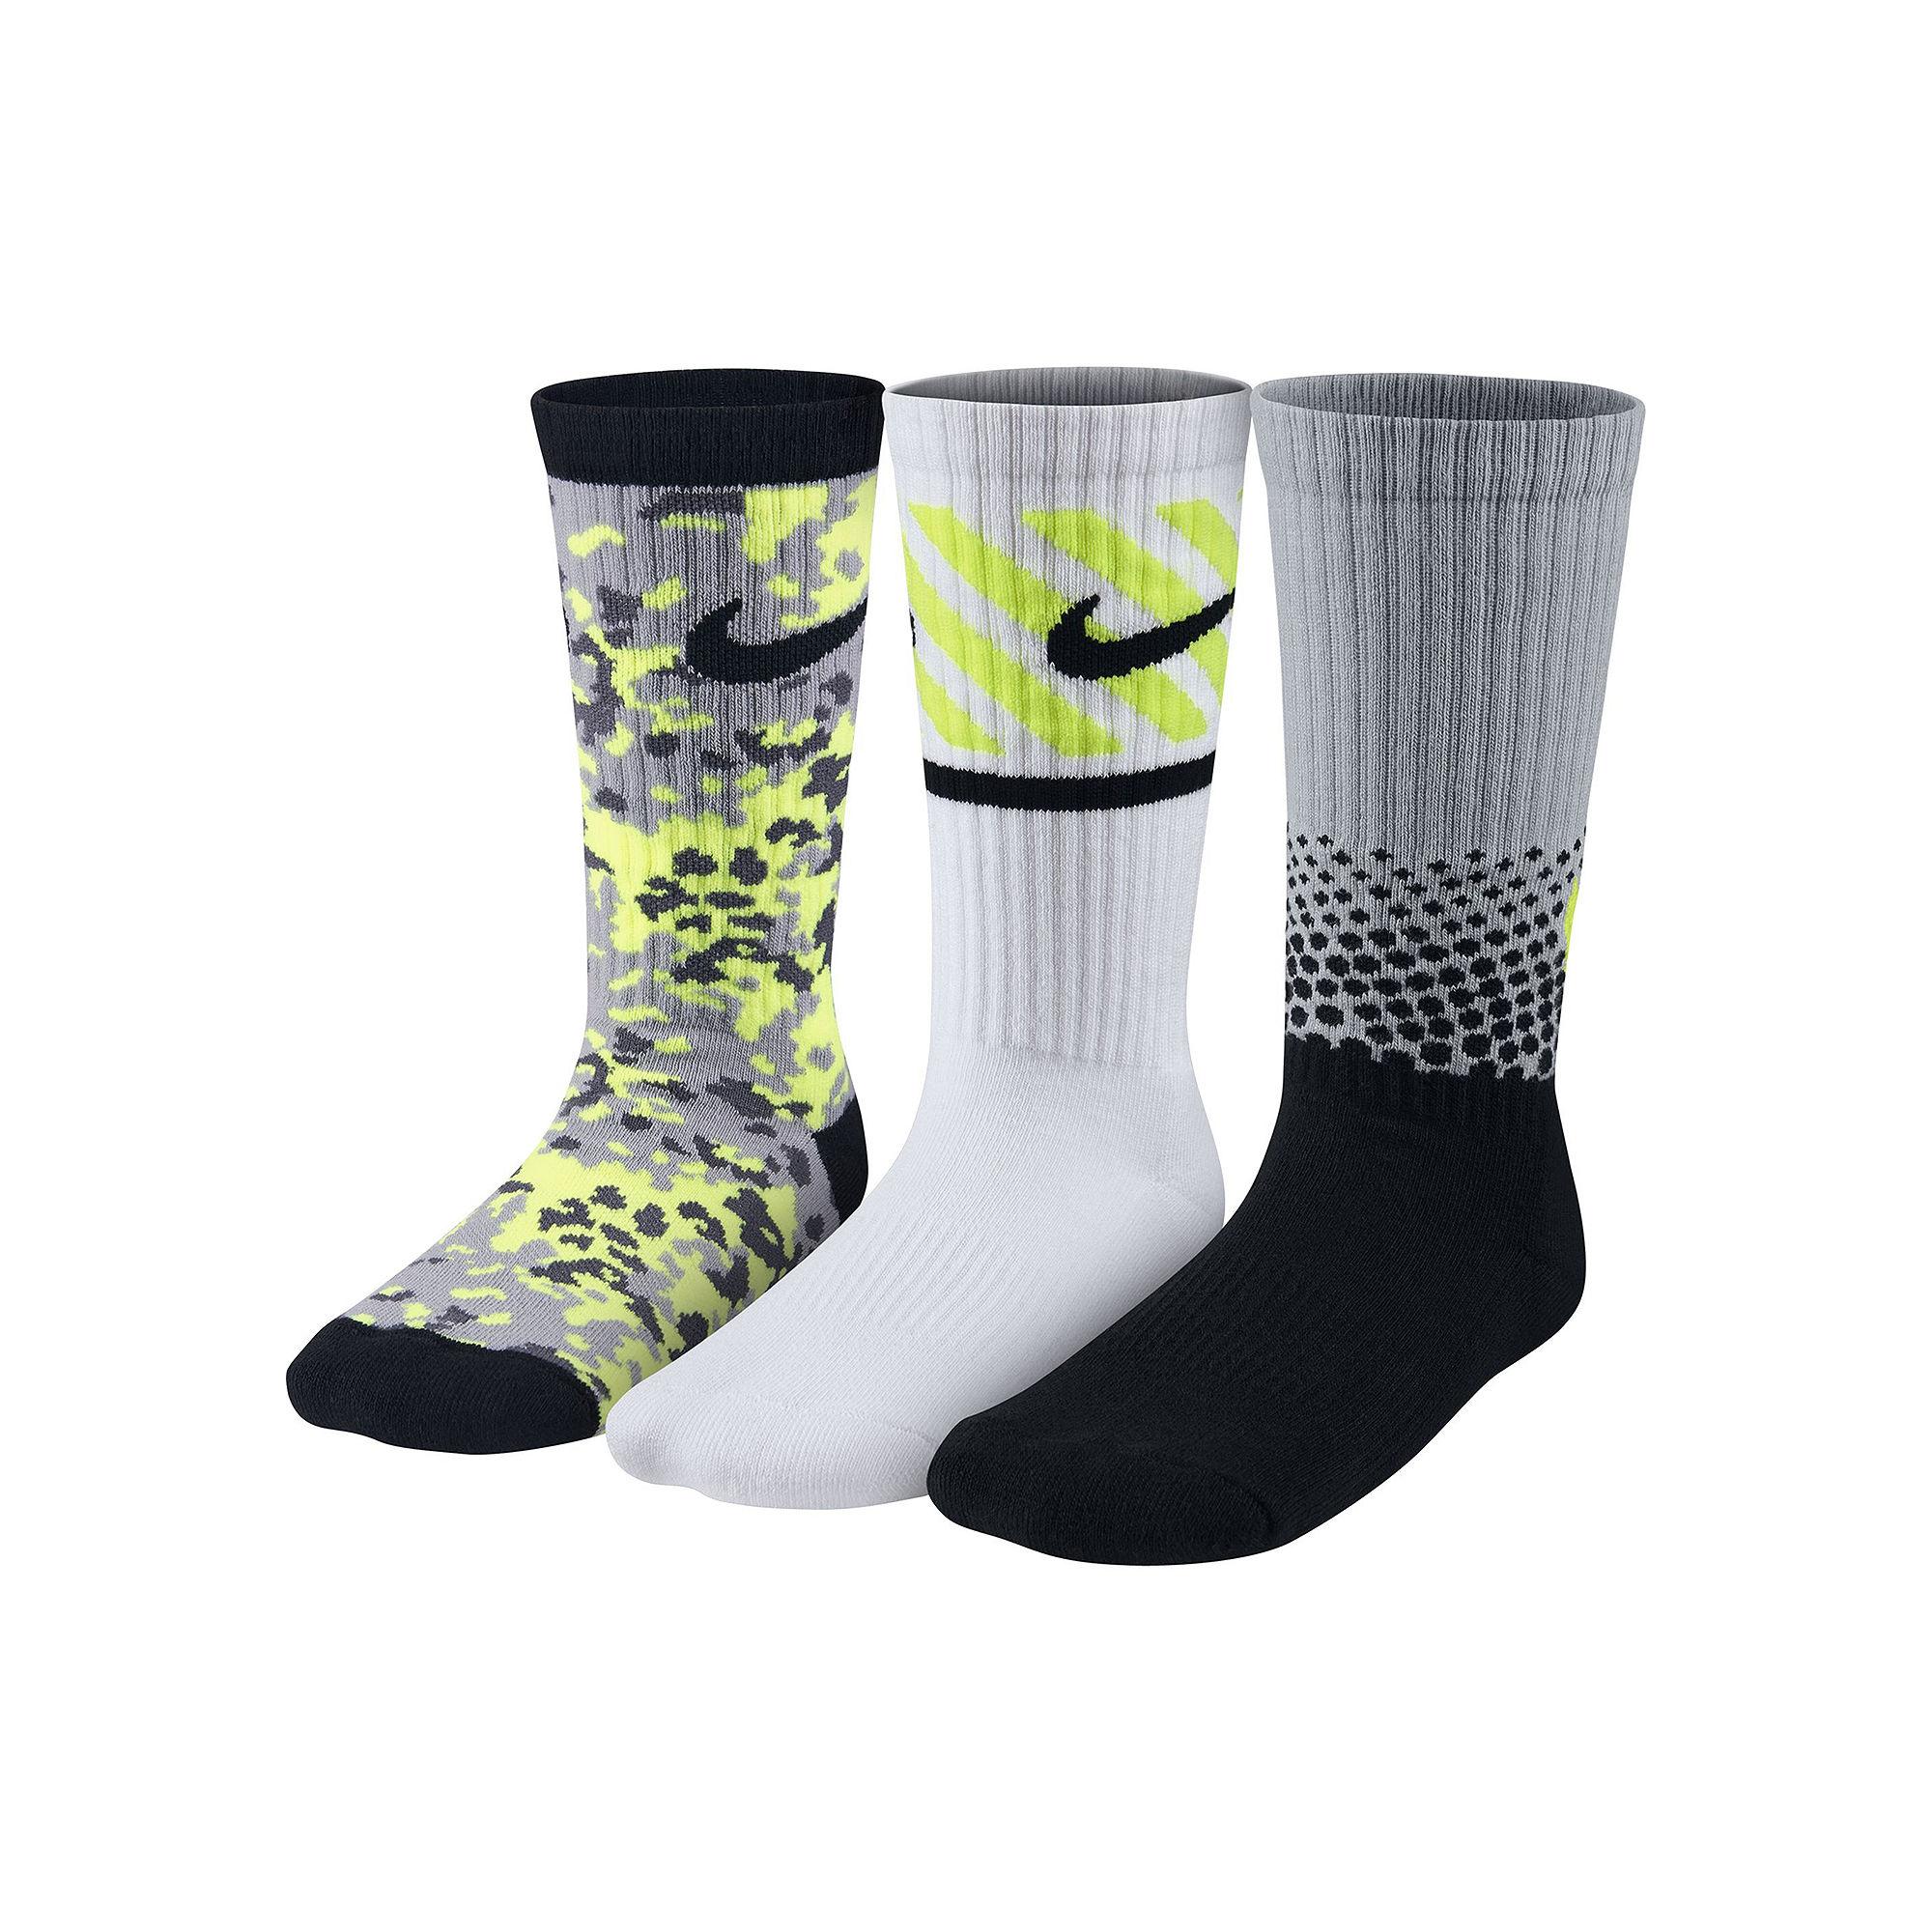 22471fa7d UPC 888409185500 product image for Nike 3-pk. Graphic Crew Socks - Boys ...